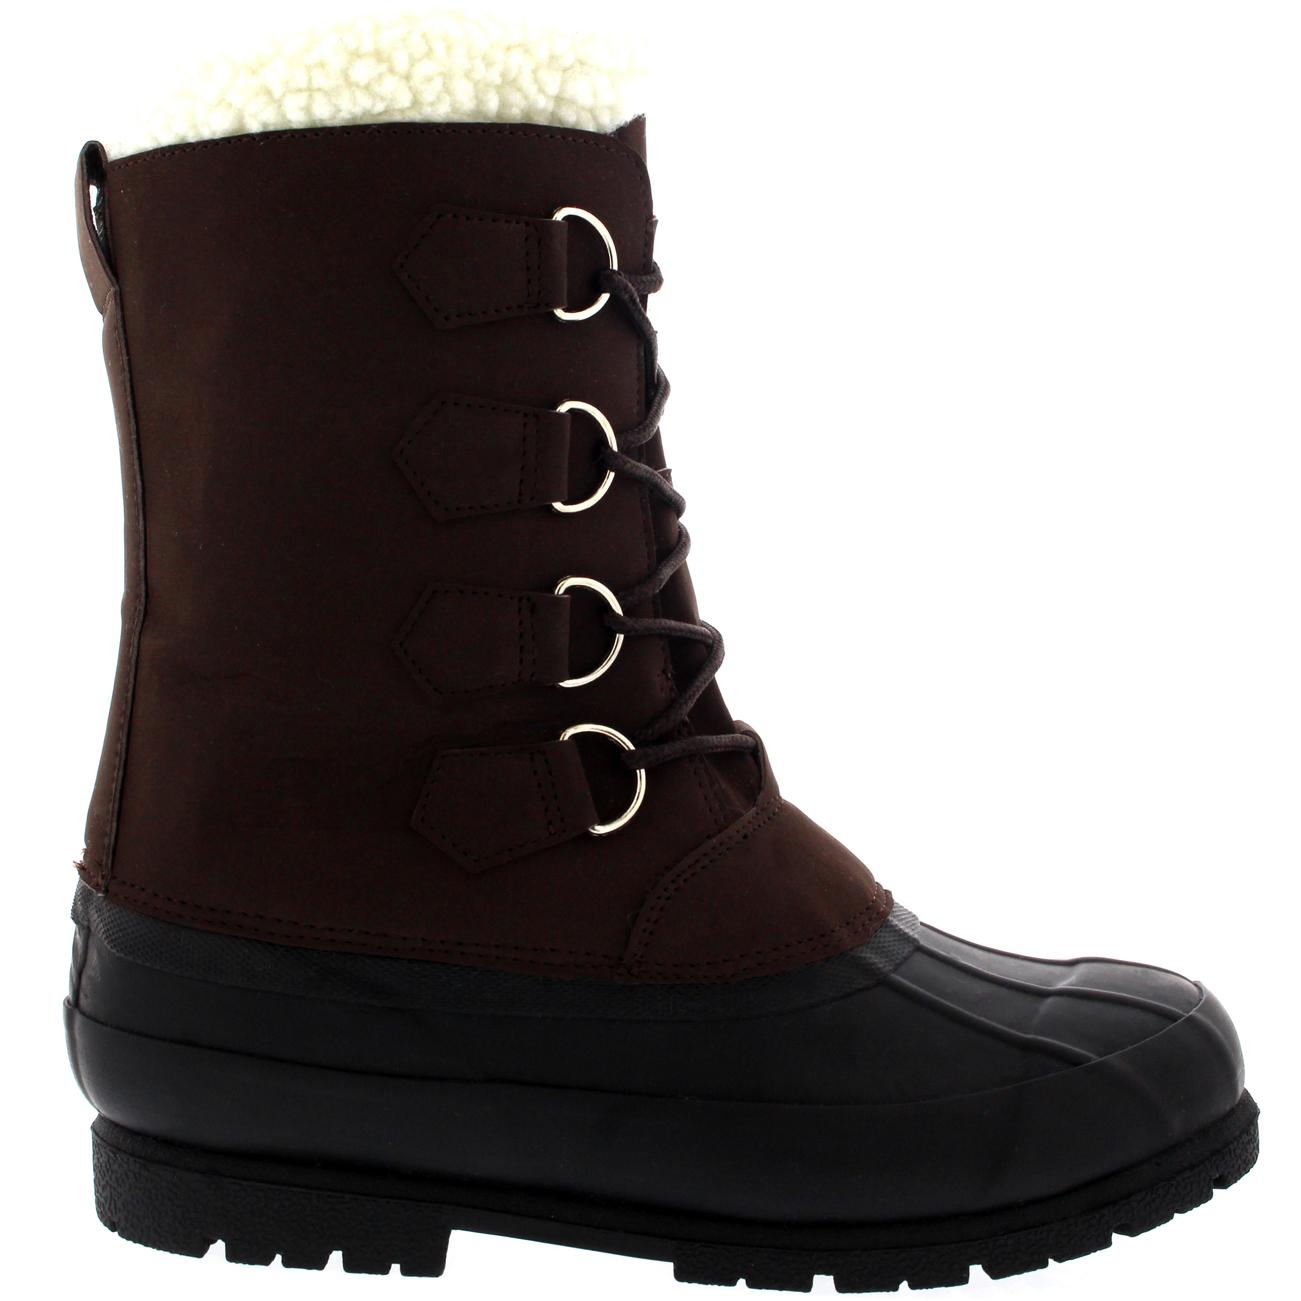 Mens Winter Wool Lined 100% Rubber Duck Sole Warm Casual